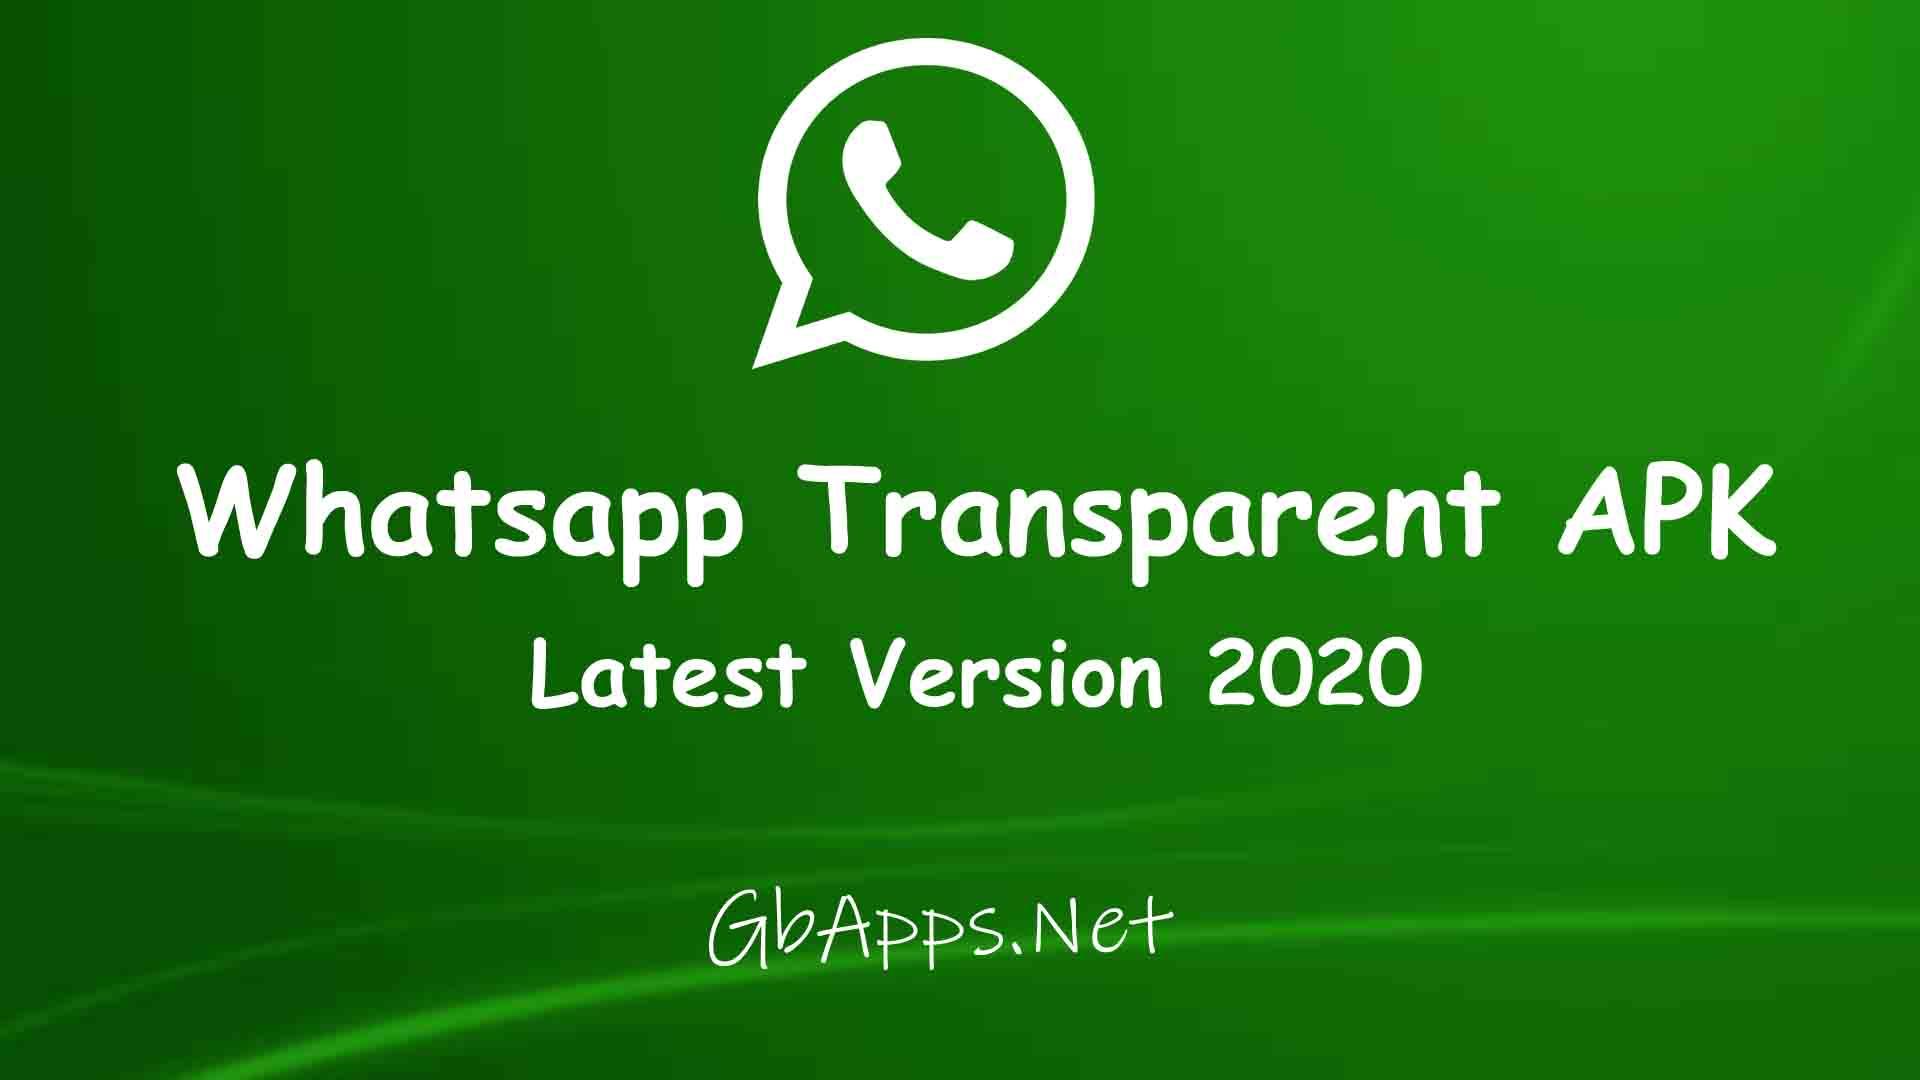 Whatsapp Transparent APK